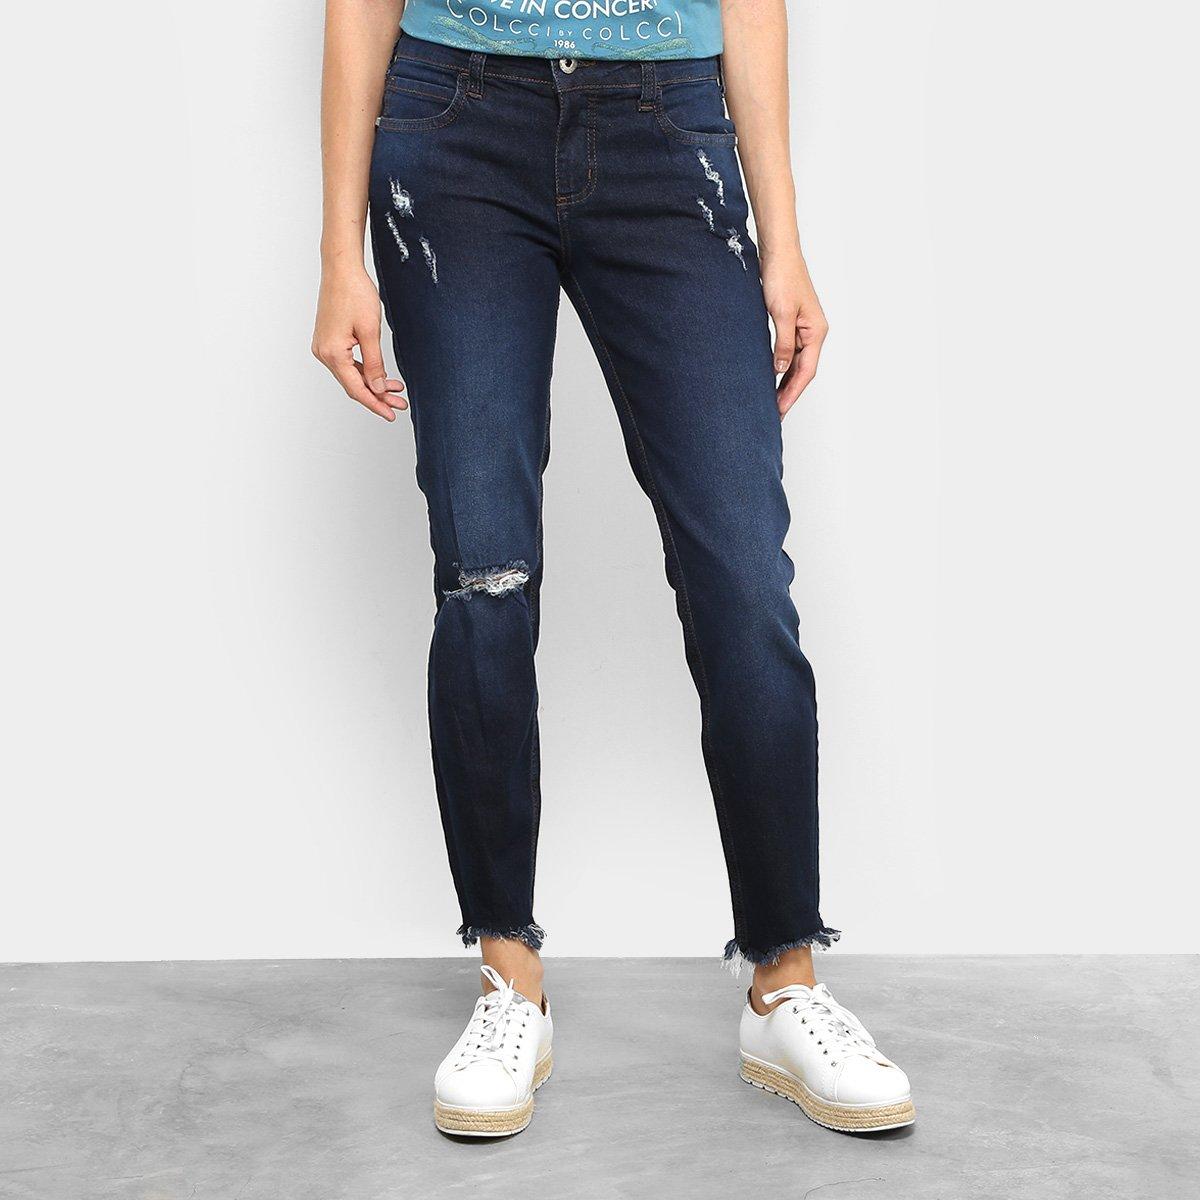 c6cf121df Calça Jeans Skinny Colcci Fátima Puídos Cintura Média Feminina | Netshoes